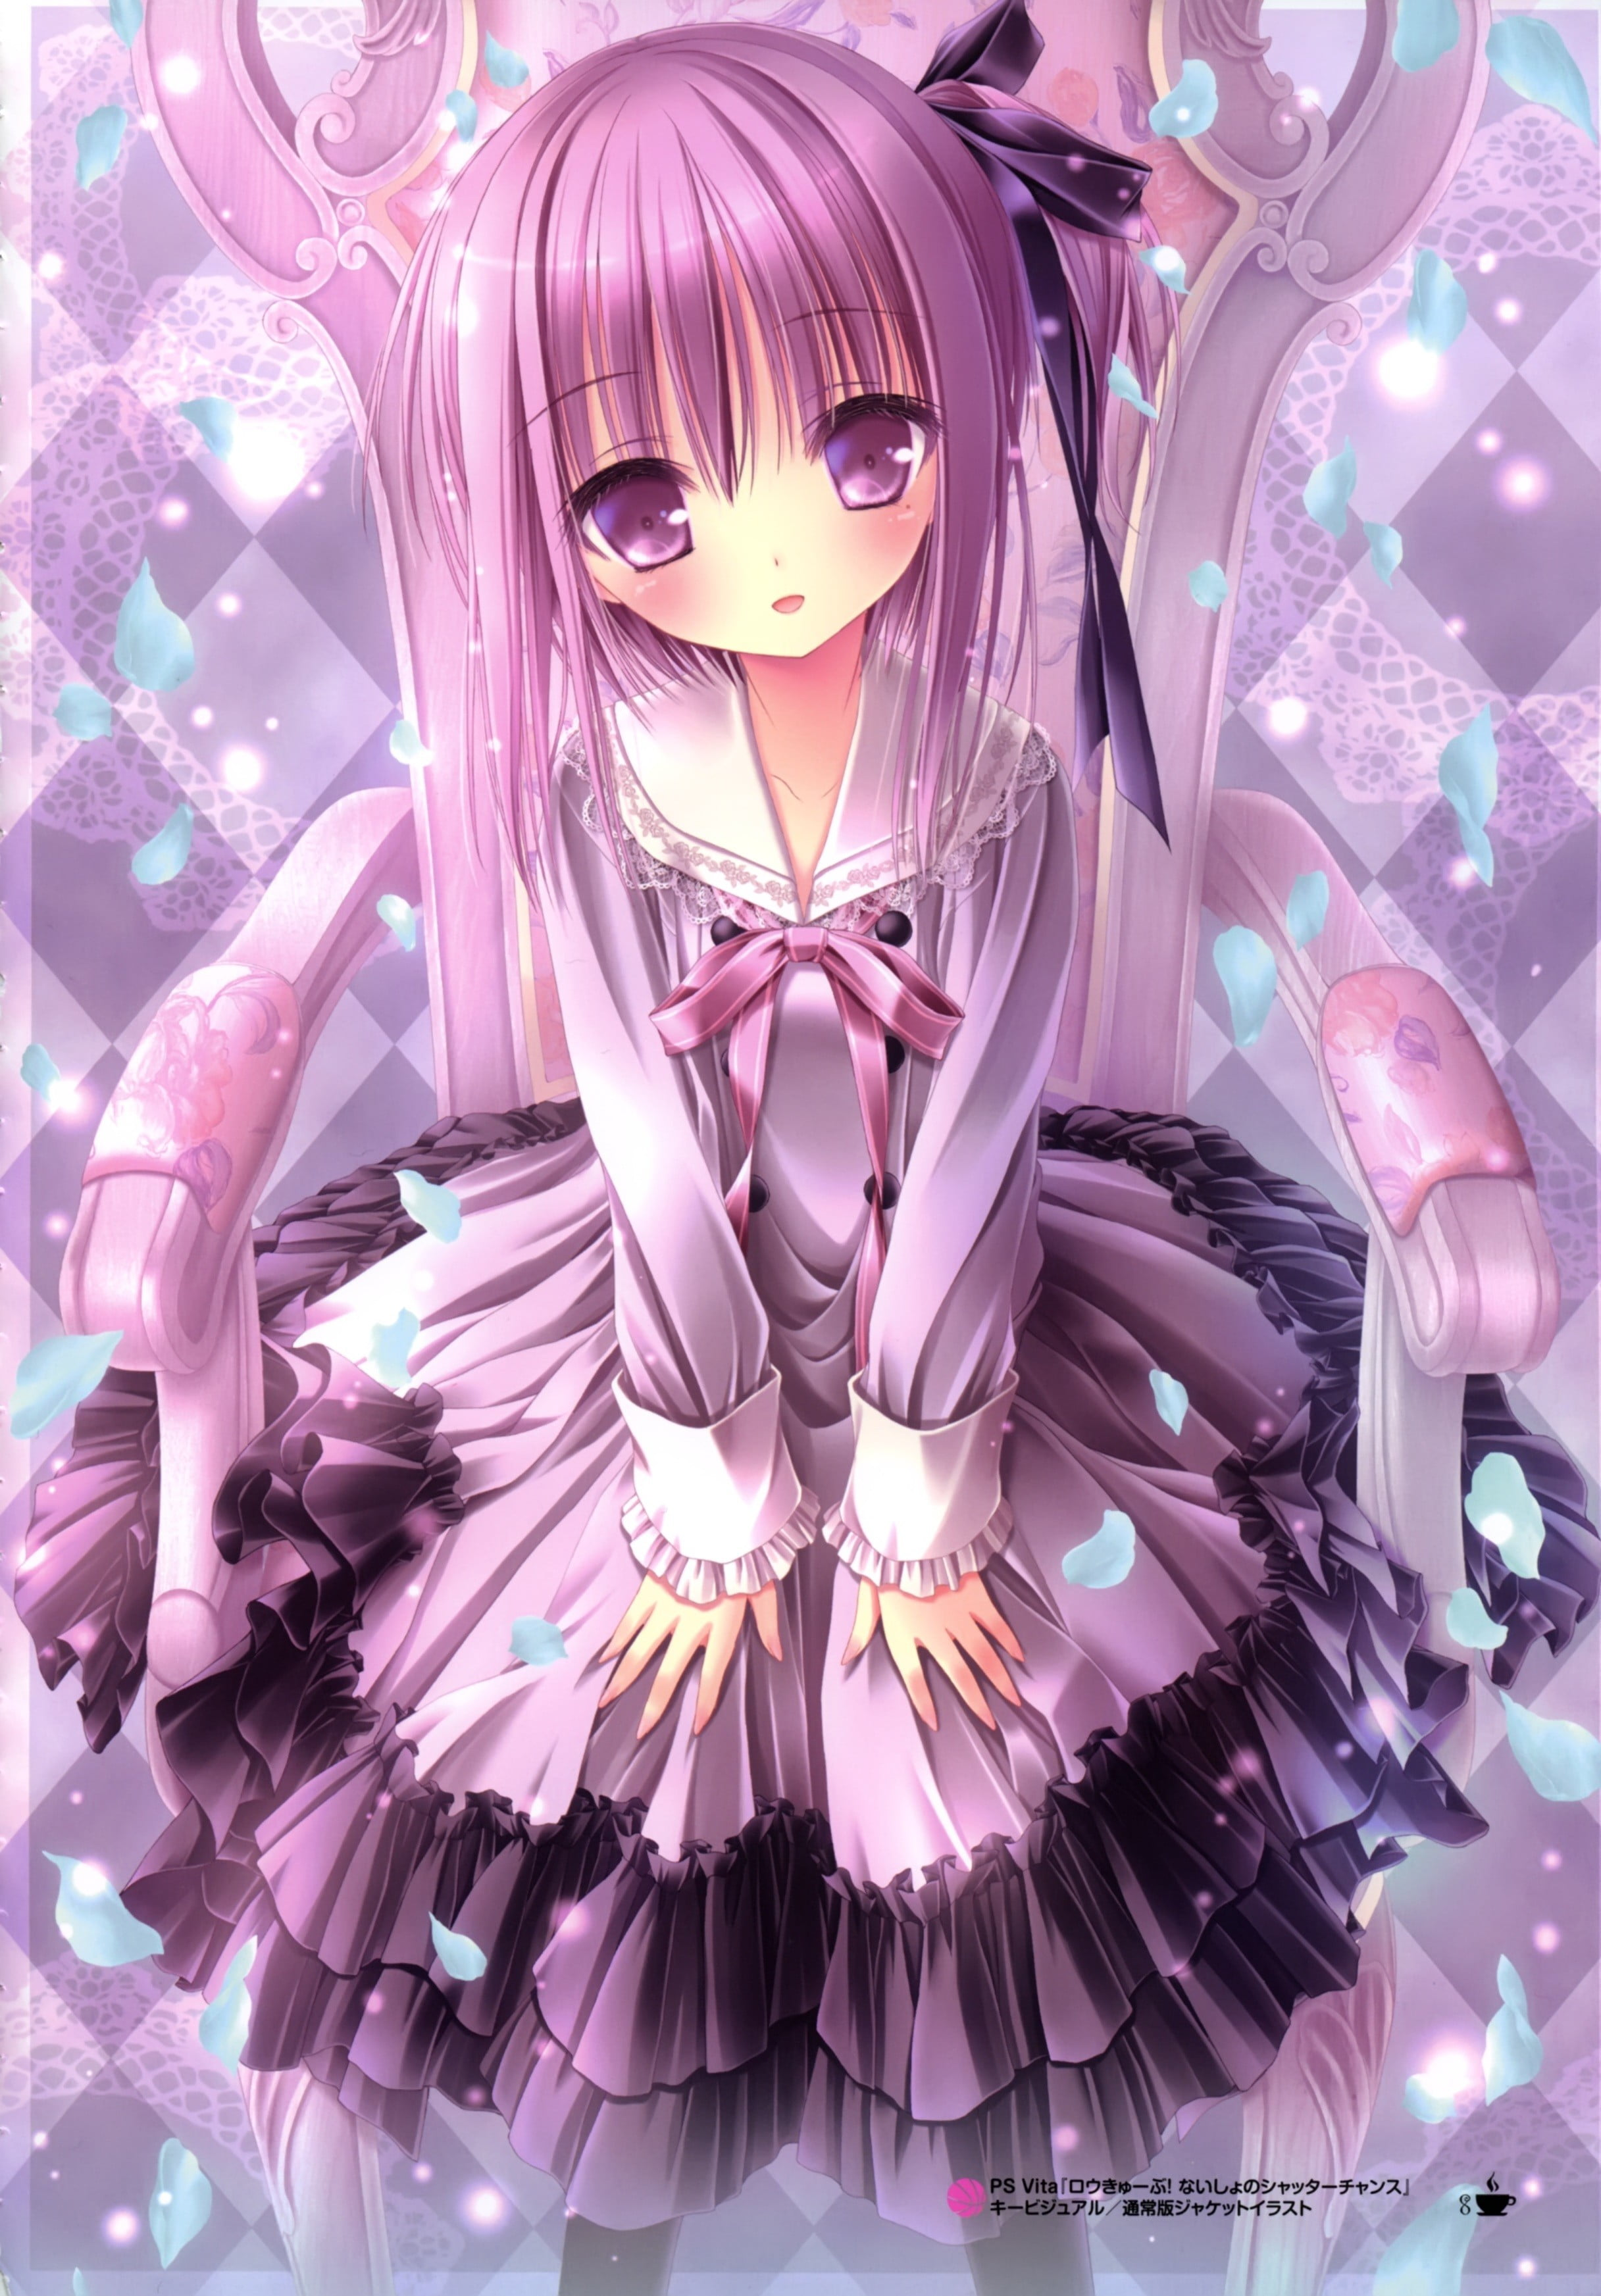 dress in purple Anime girl